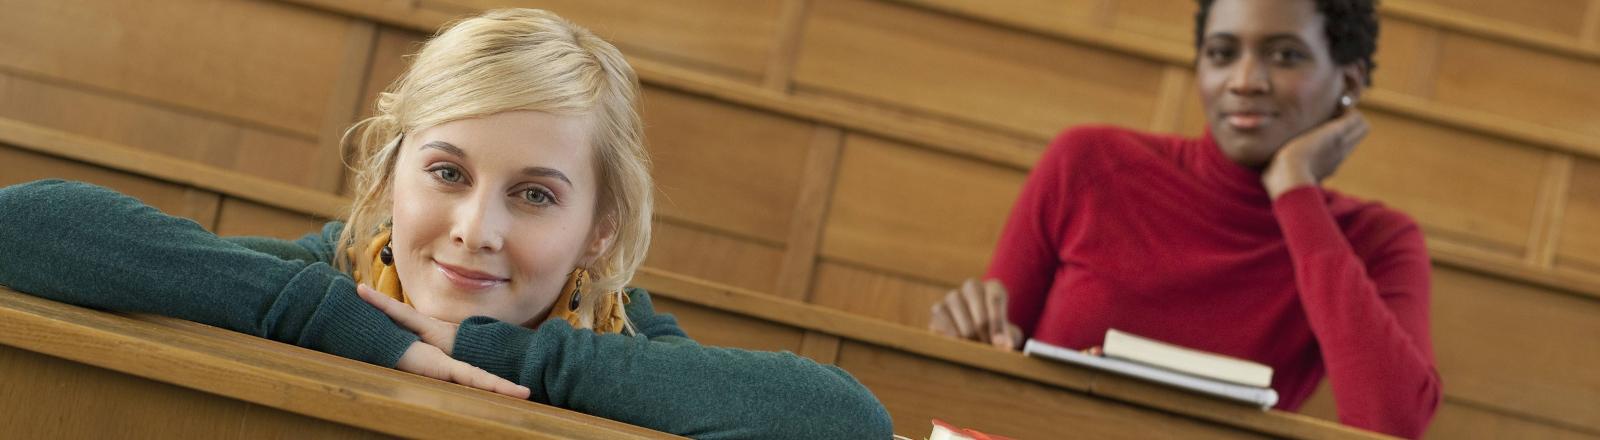 Zwei Studentinnen sitzen im Hörsaal.